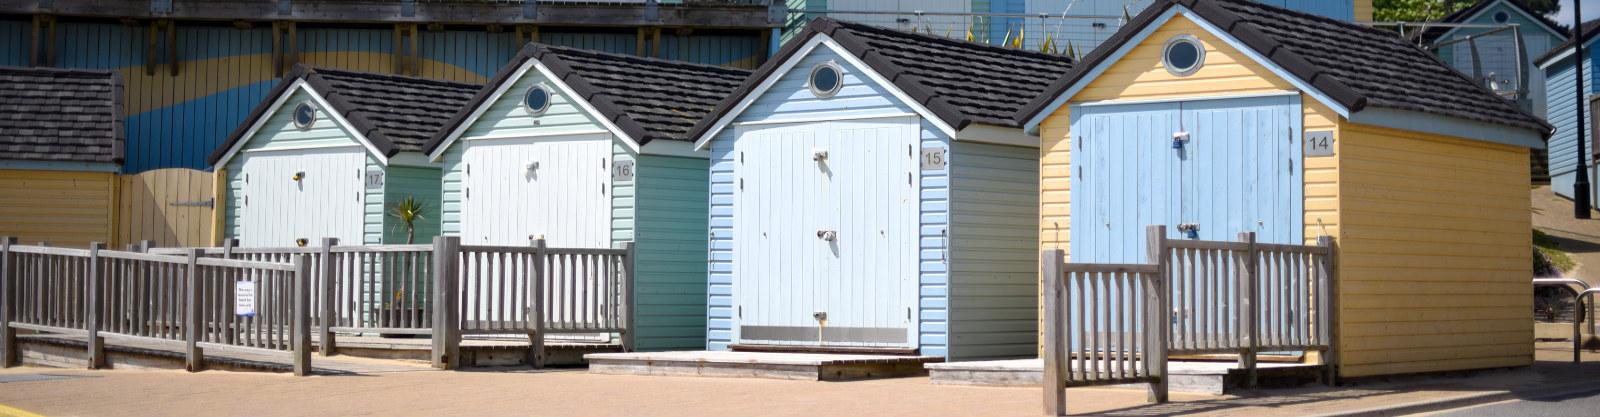 beach-huts-riviera-hotel-bournemouth